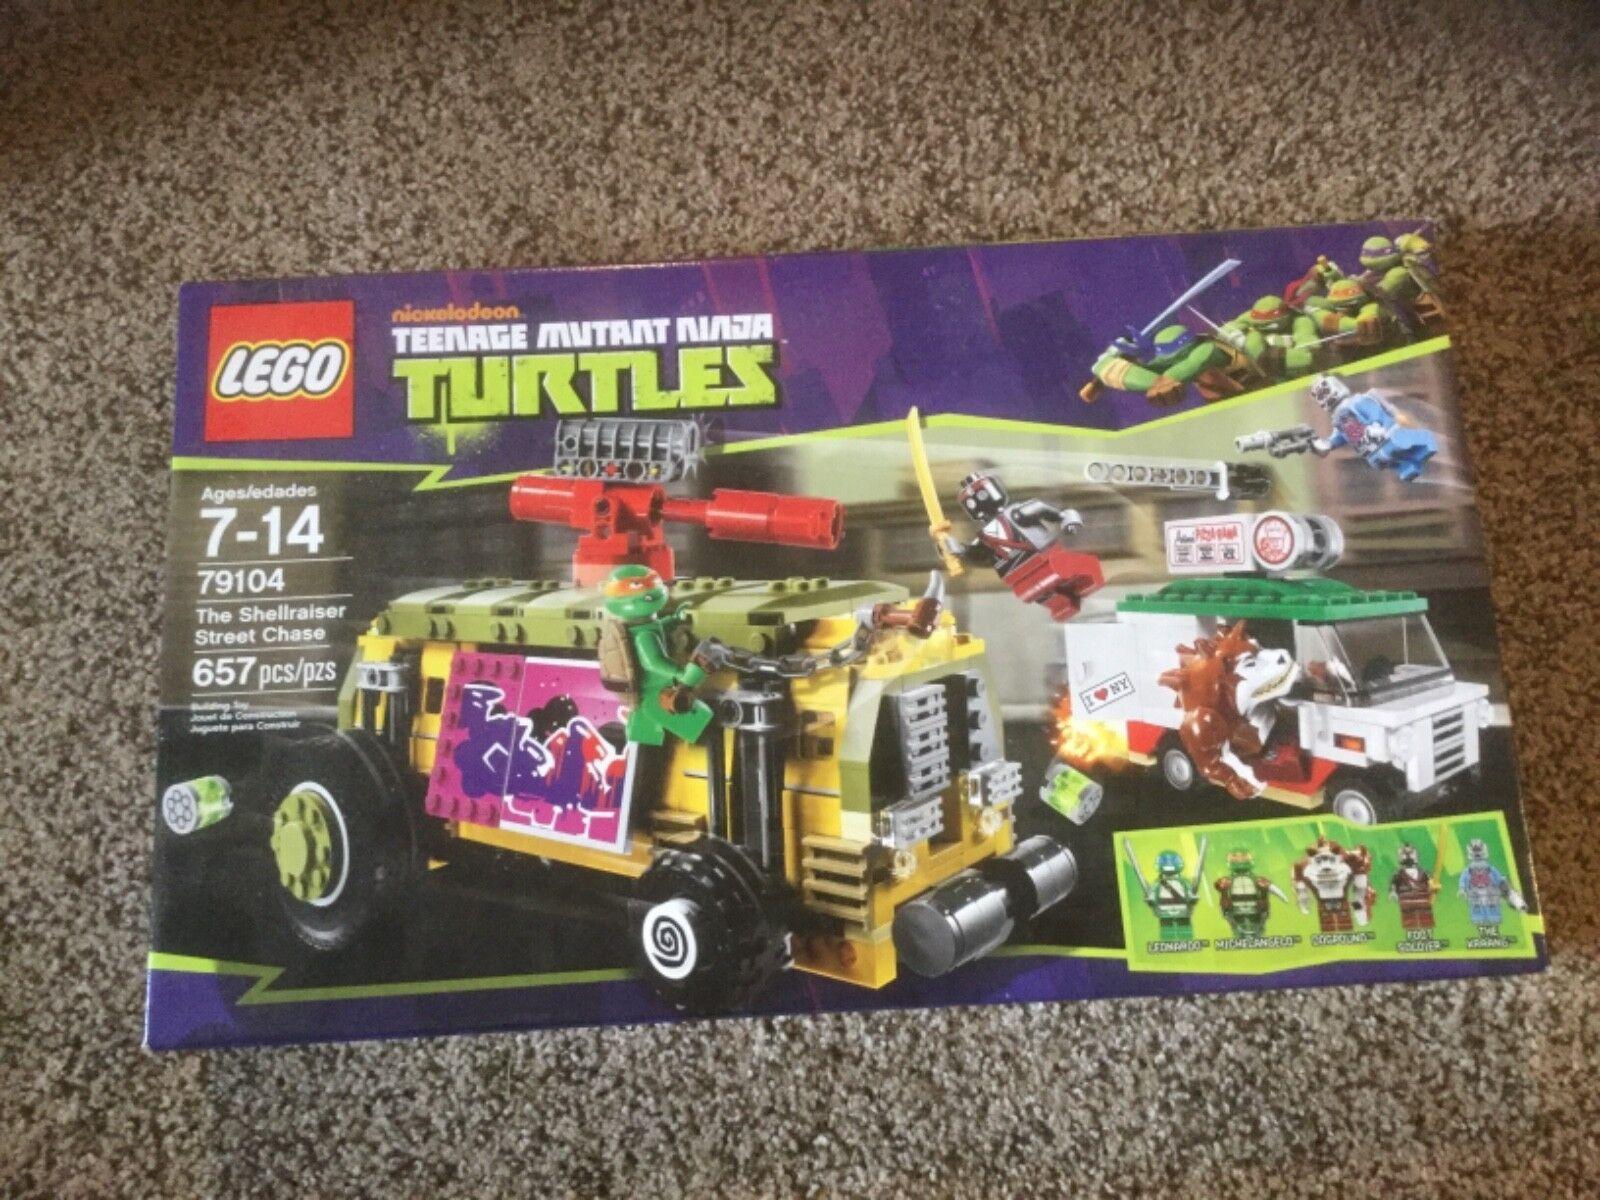 NIB LEGO Teenage Mutant Mutant Mutant Ninja Turtles The Shellraiser Street Chase (79104) e60459